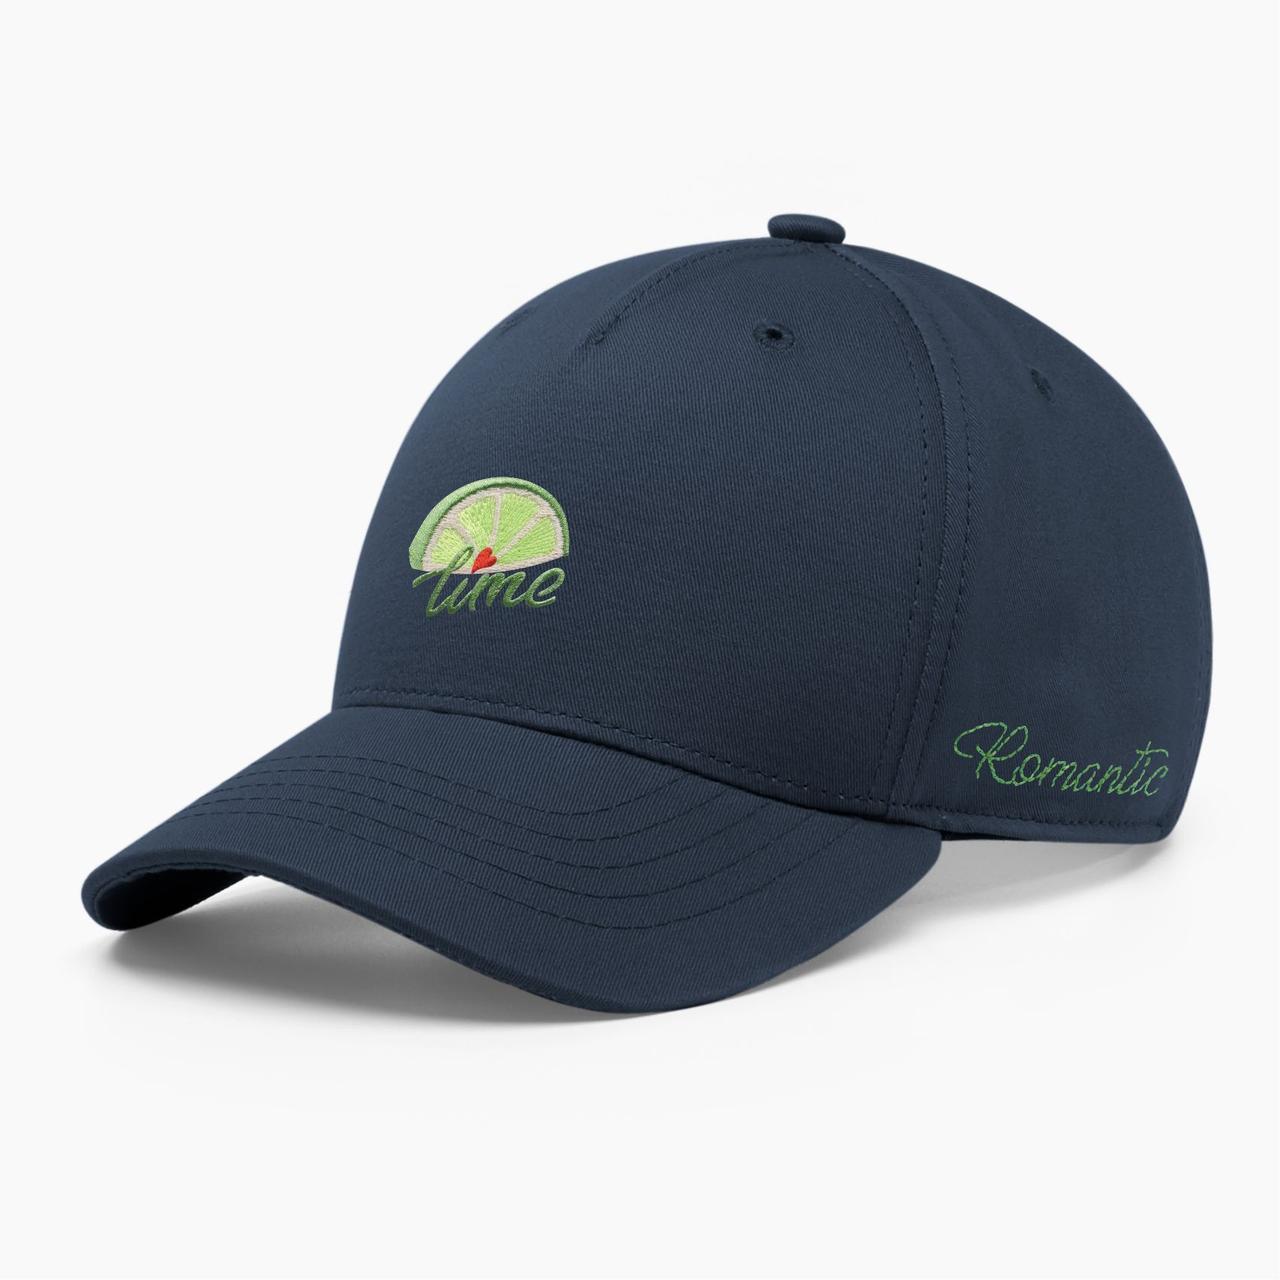 Женская кепка бейсболка INAL лайм S / 53-54 RU Синий 285353